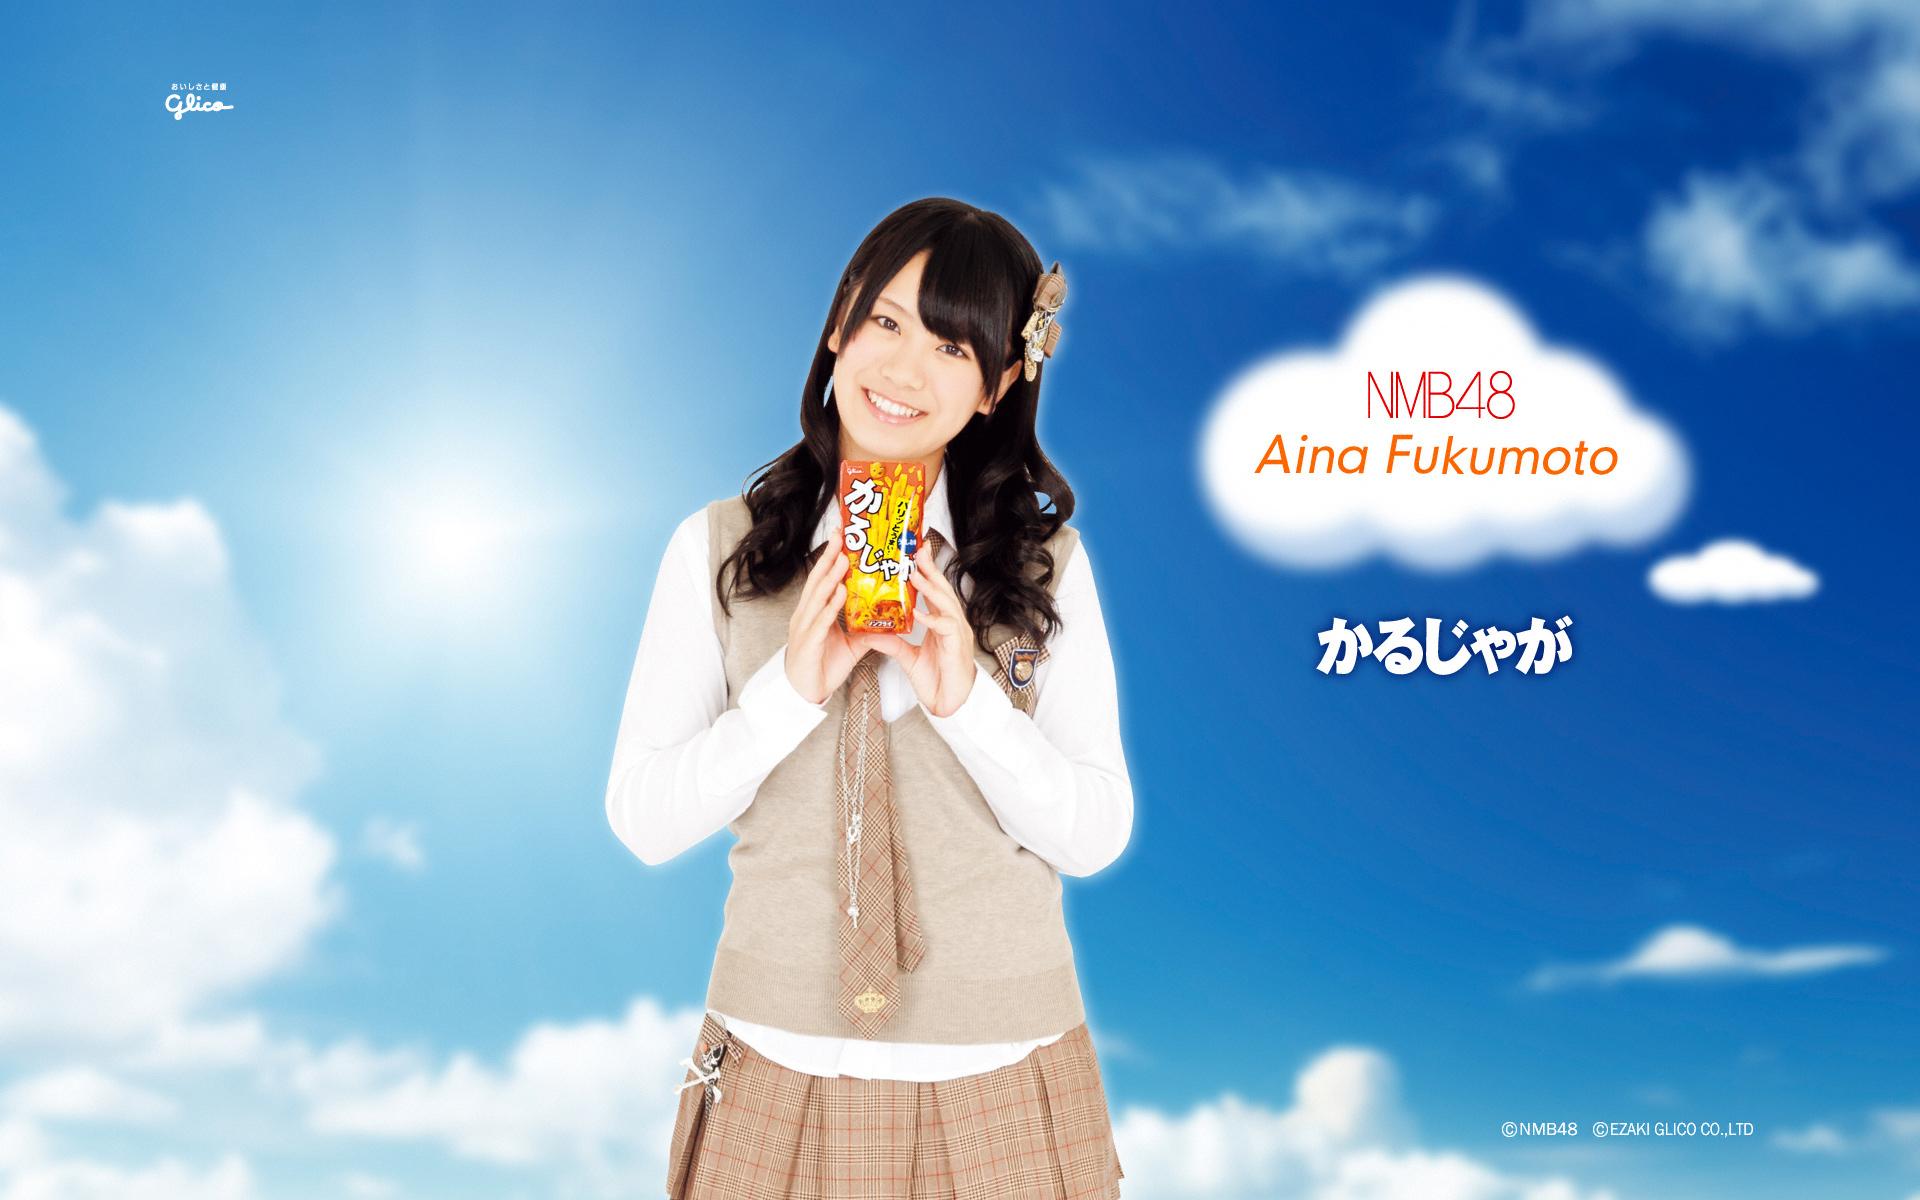 NMB48(AKB48和SKE48的姐妹团体组合)(壁纸1)